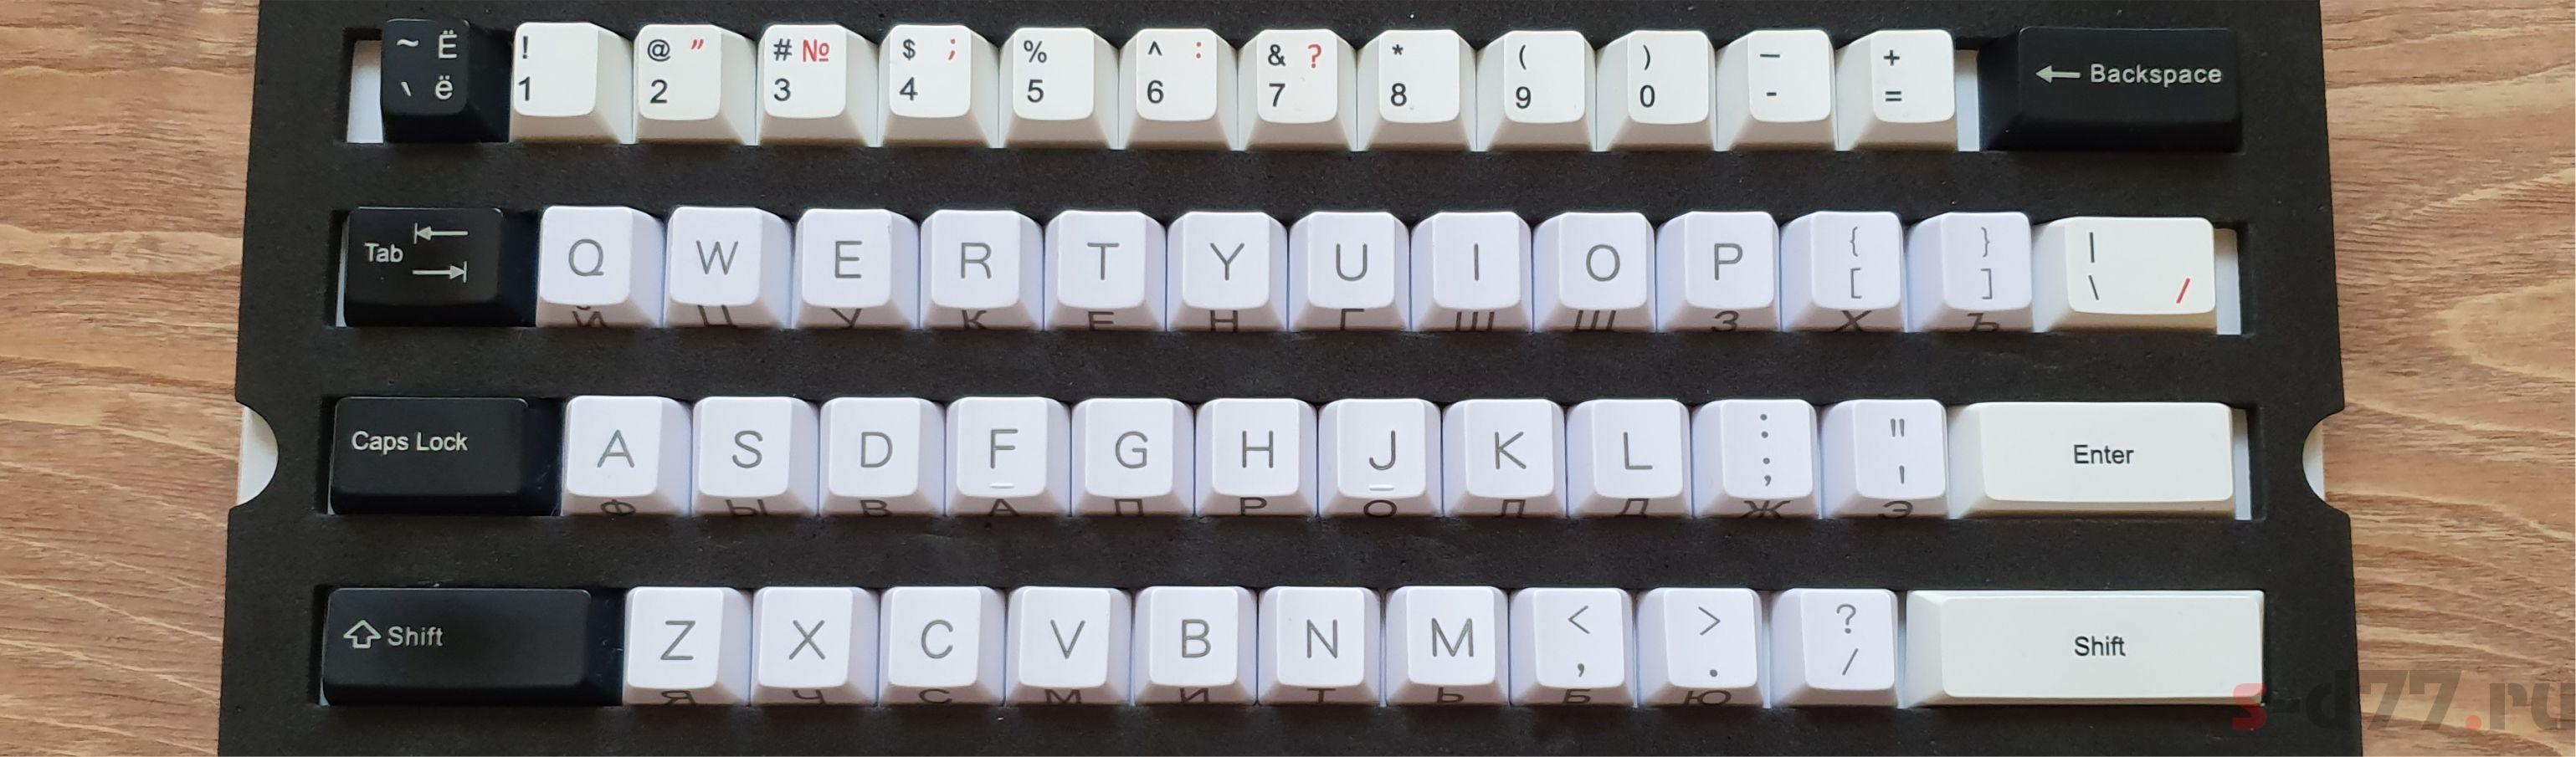 Гравировка на клавиатуре Щербинка